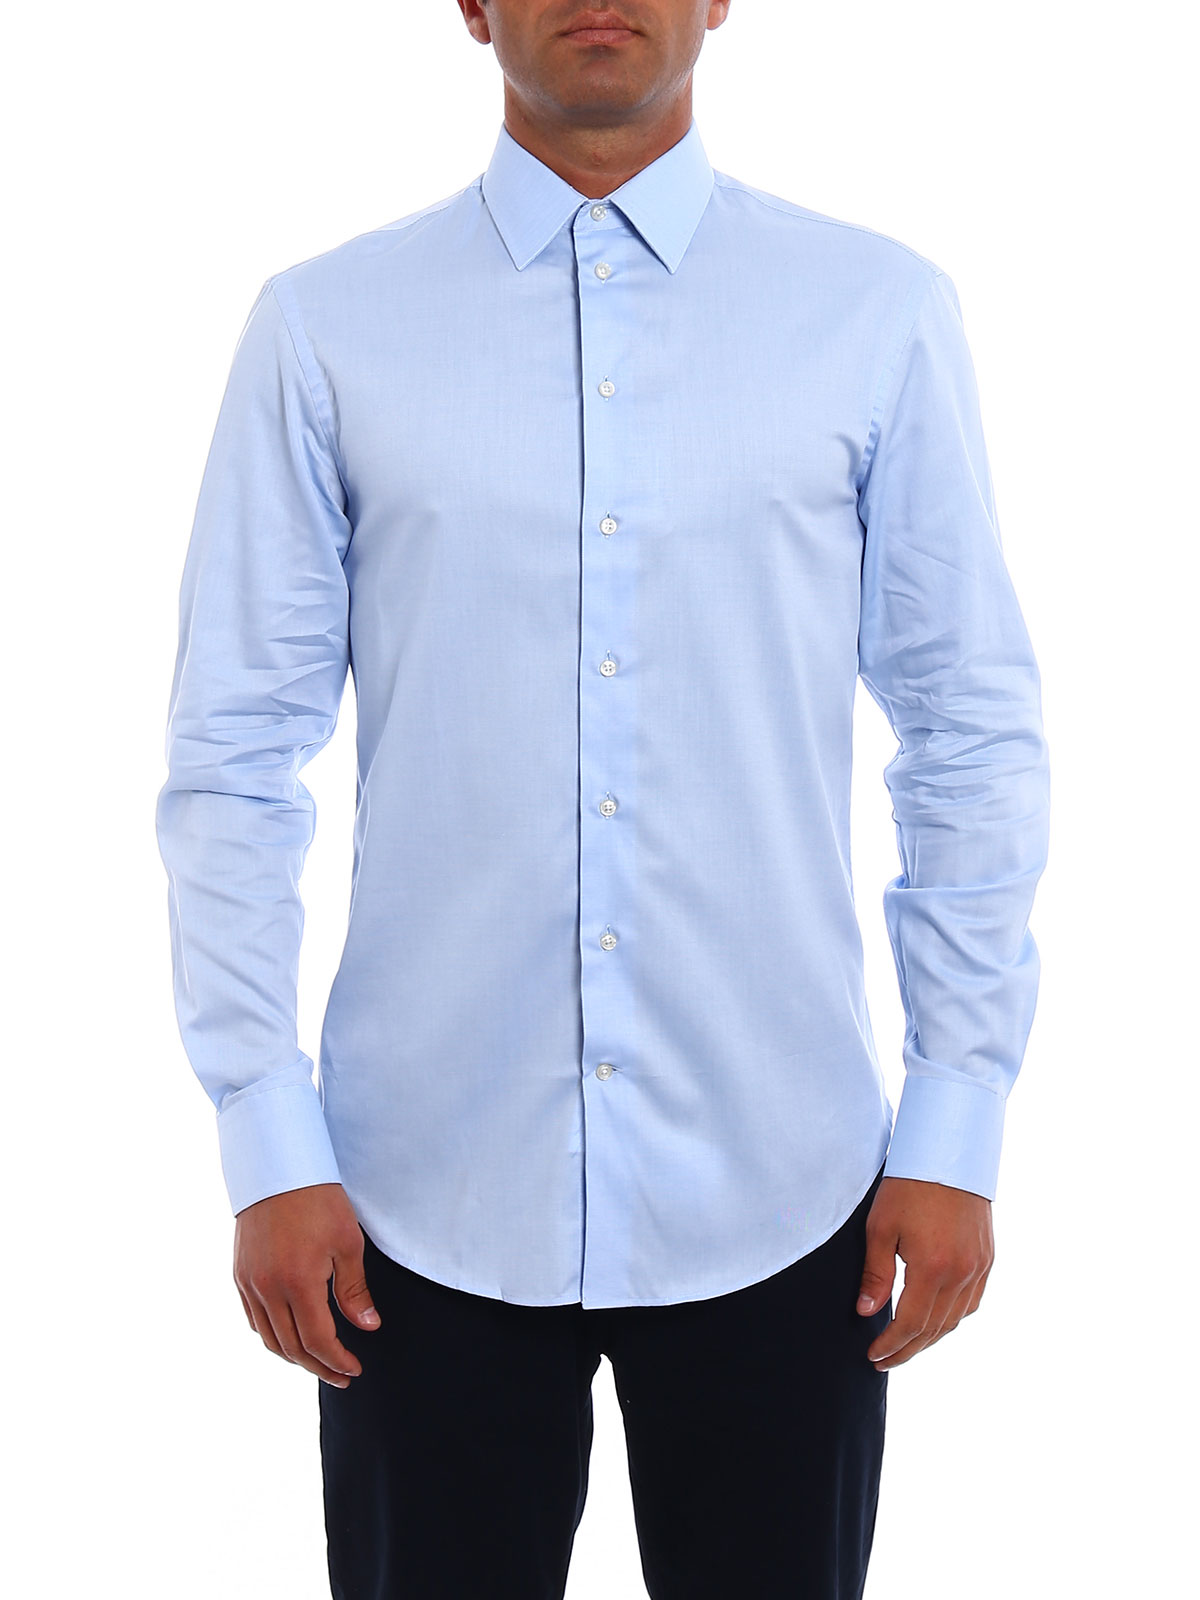 Light Blue Cotton Modern Fit Shirt By Armani Collezioni